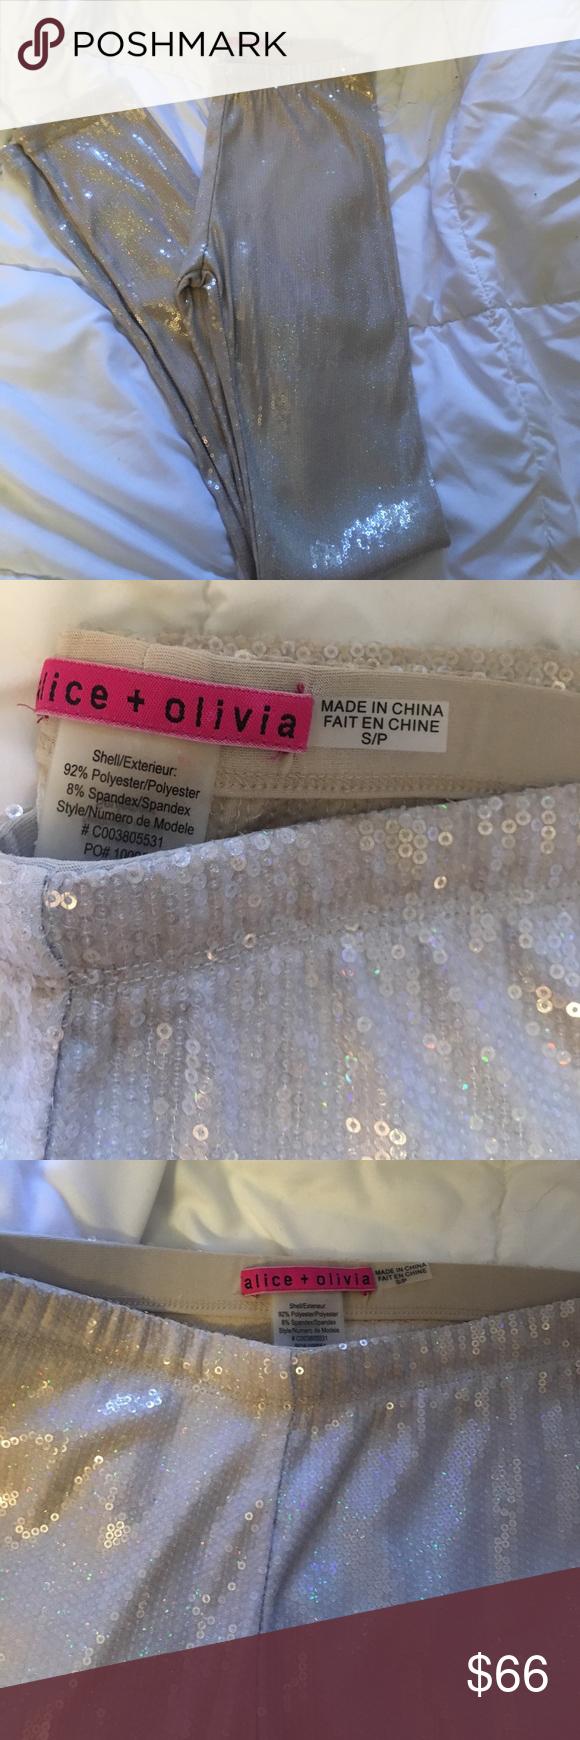 Alice + Olivia  Sequinc Leggings 💗💗💗 Trendy Alice + Olivia leggings. Super cute and stylish. In great shape! Worn once! Size small. Alice + Olivia Pants Leggings